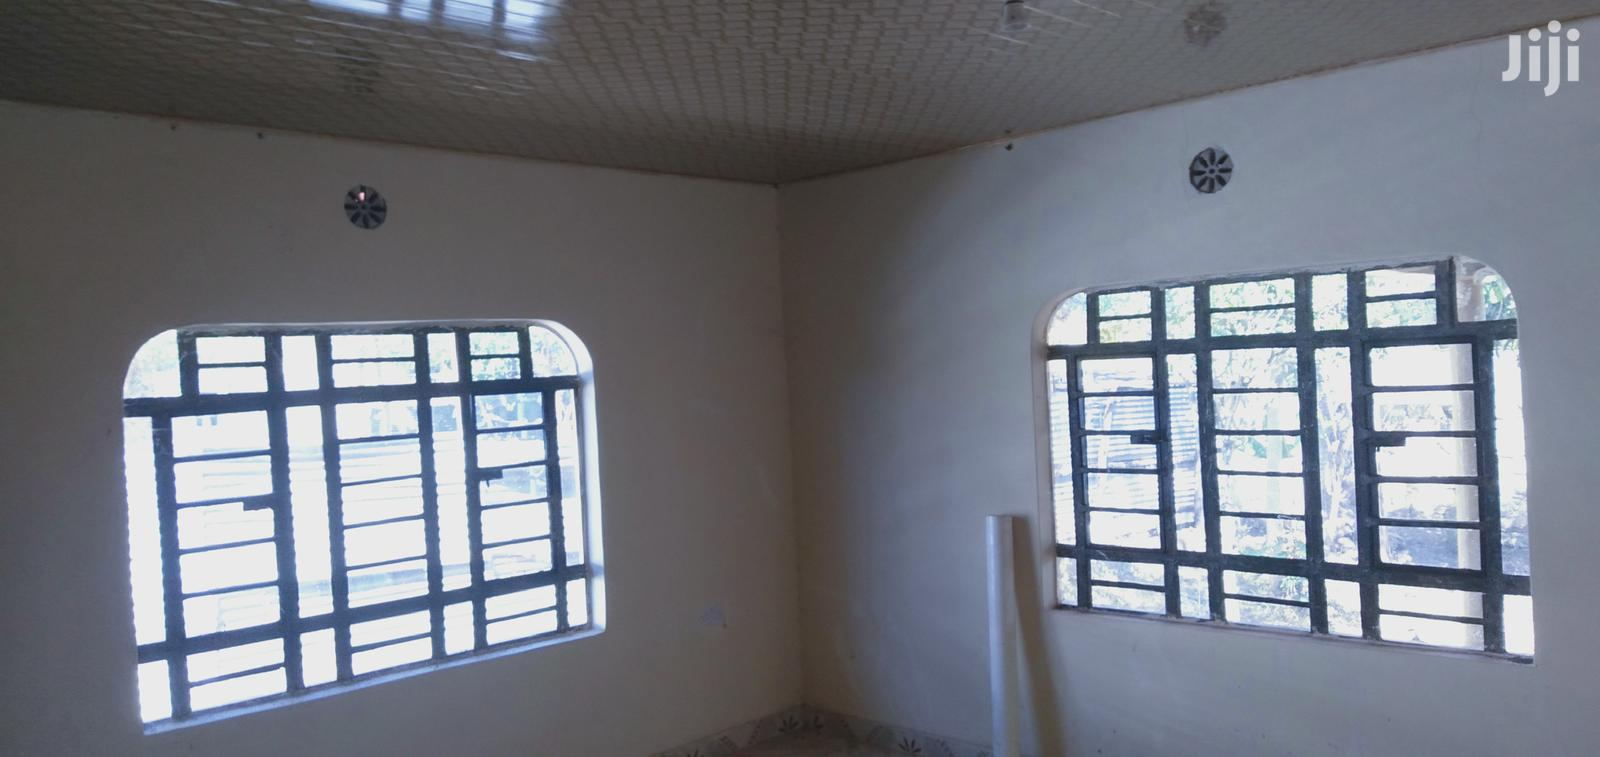 3 Bedroomed Bungalow For Sale At Ruiru Murera   Houses & Apartments For Sale for sale in Ruiru, Kiambu, Kenya